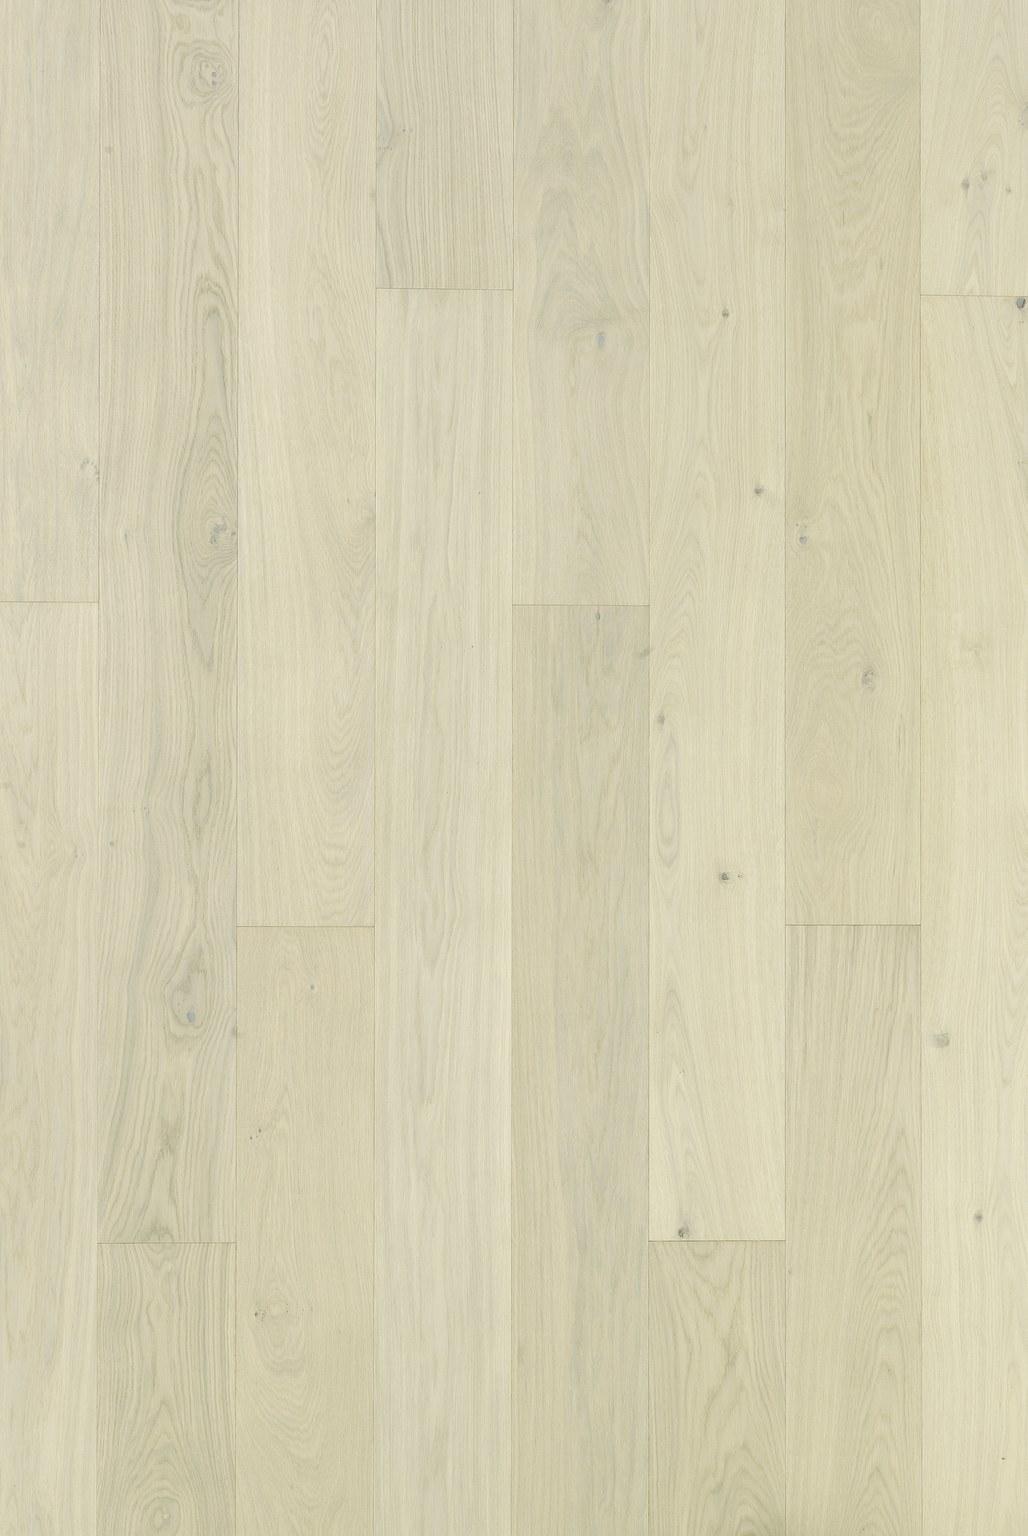 Timberwise Parketti Lankkuparketti Puulattia Wooden Floor Parquet Plank Tammi Oak Cream 2D1